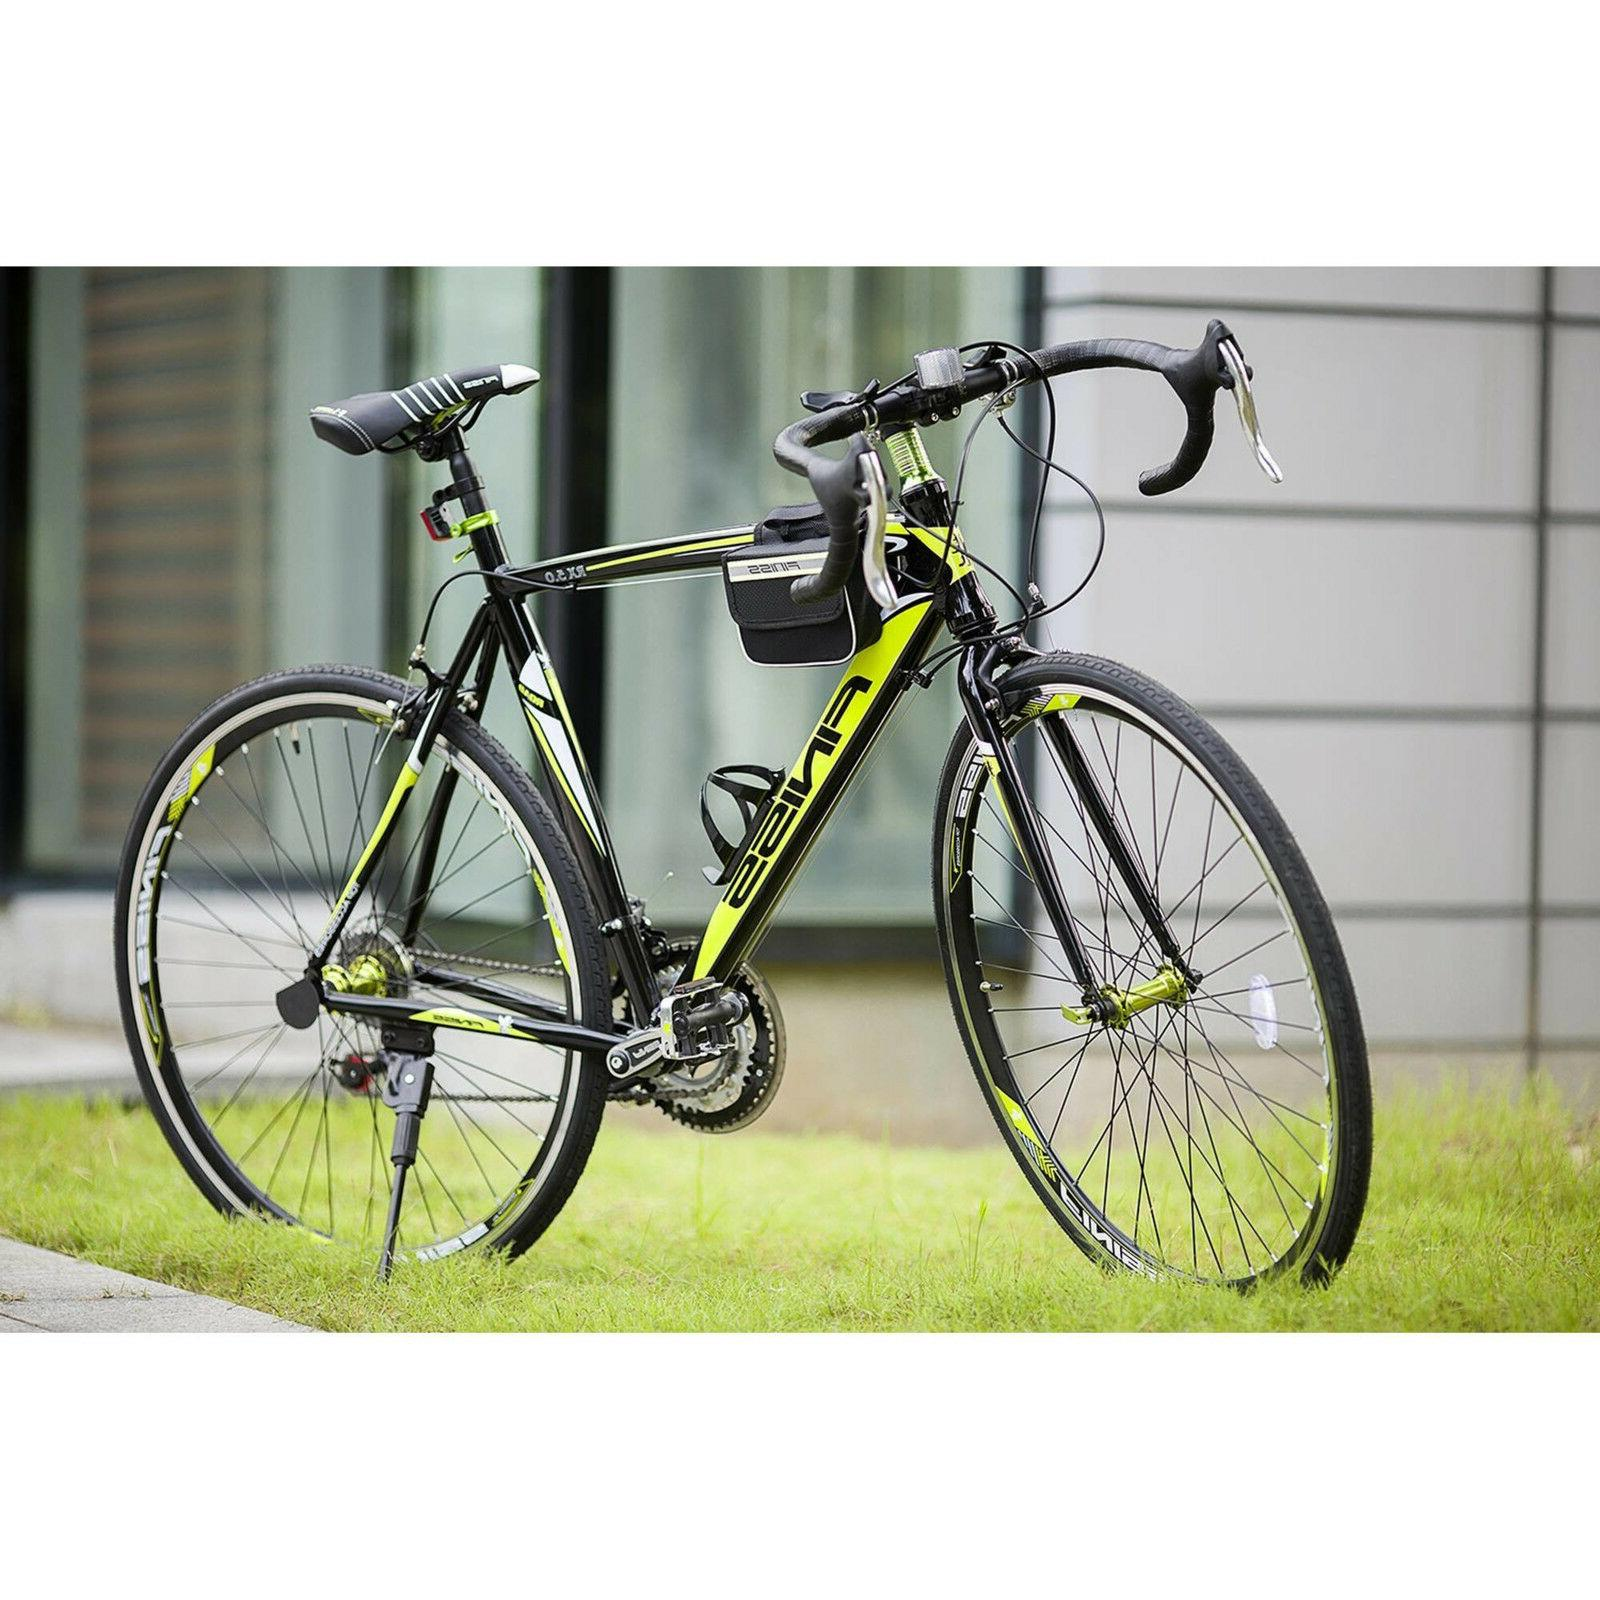 Merax 21 Speed 700C Bike Racing